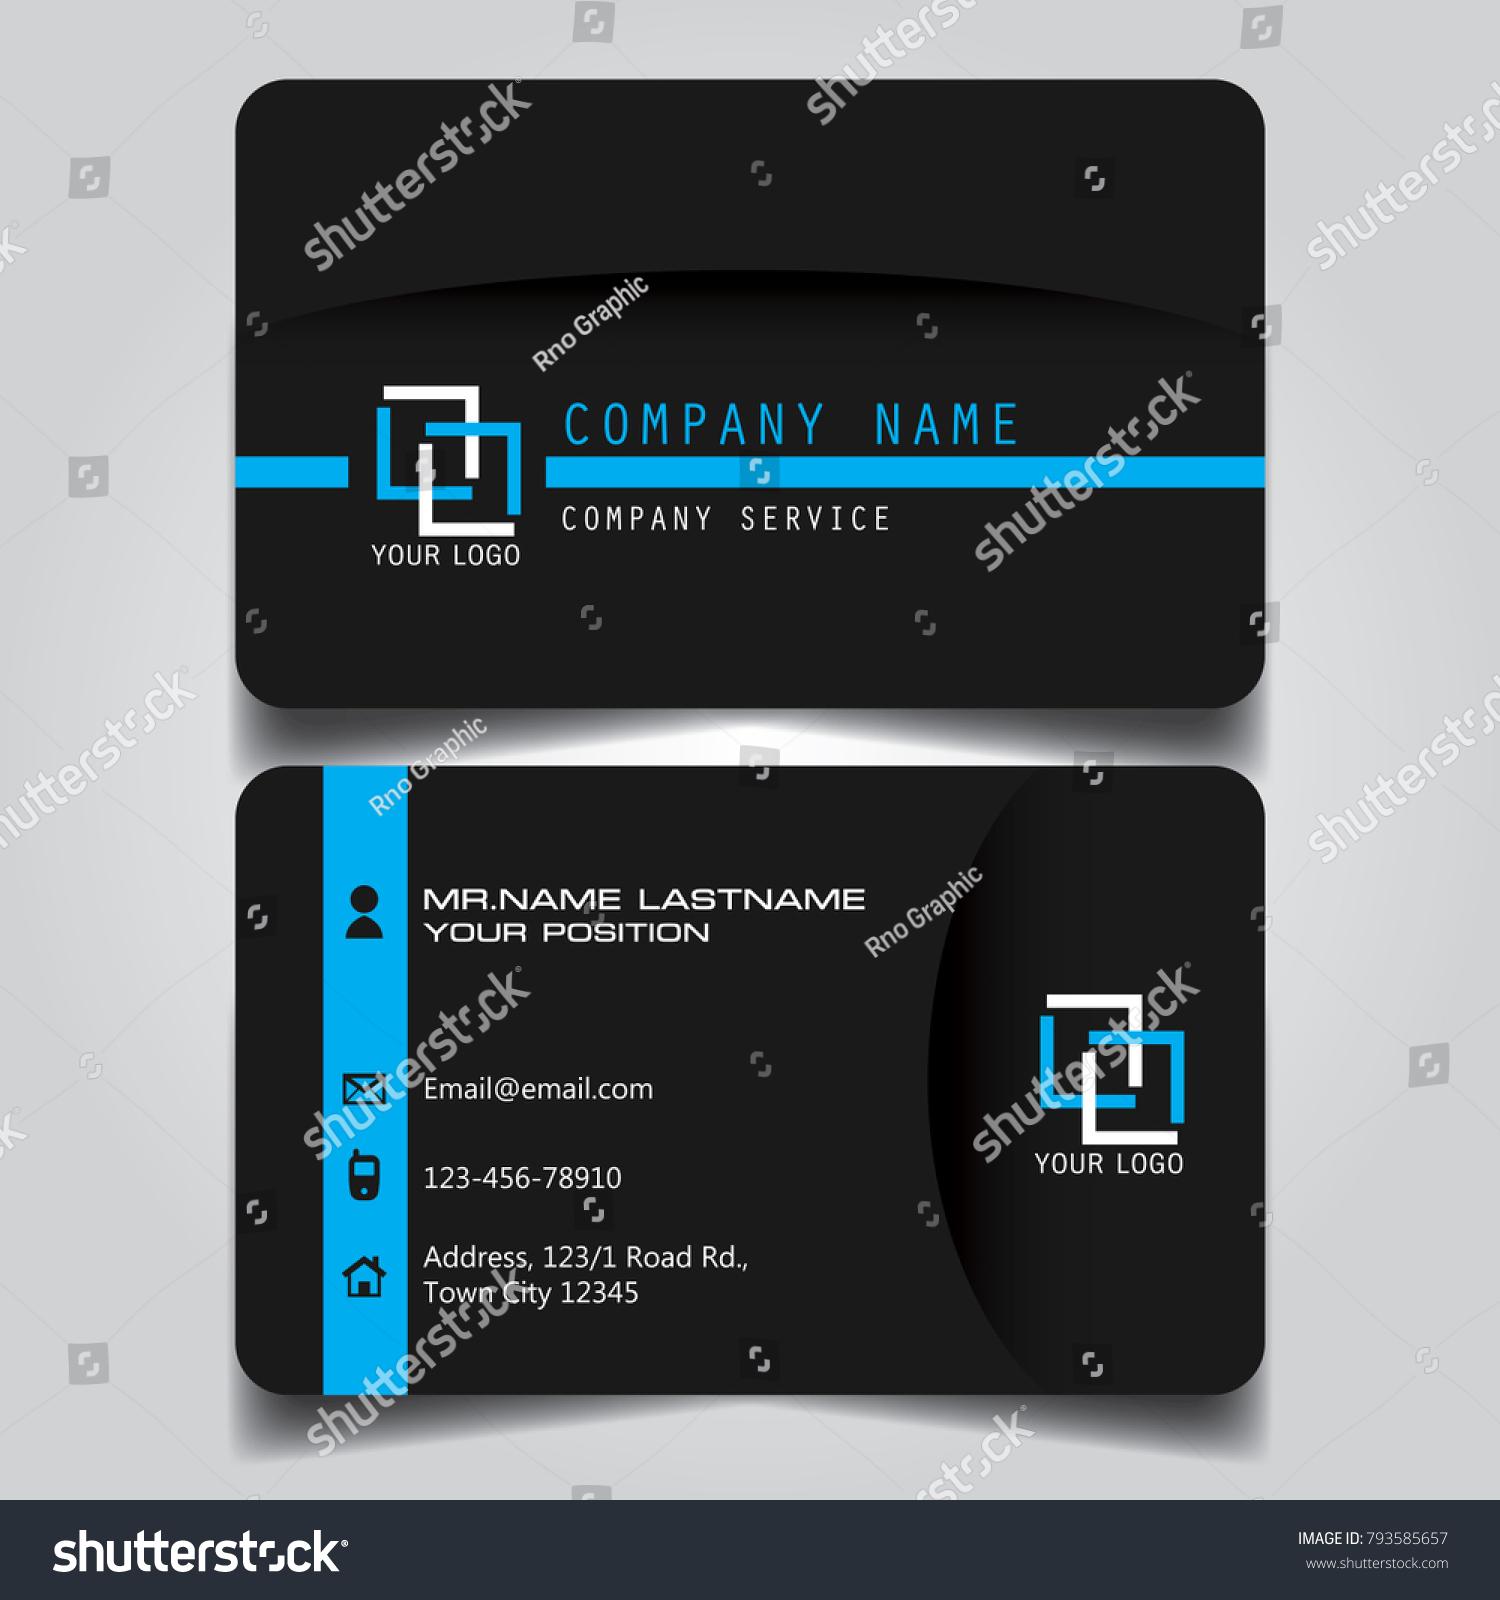 Dark Blue Name Card Business Card Stock Vector 793585657 - Shutterstock